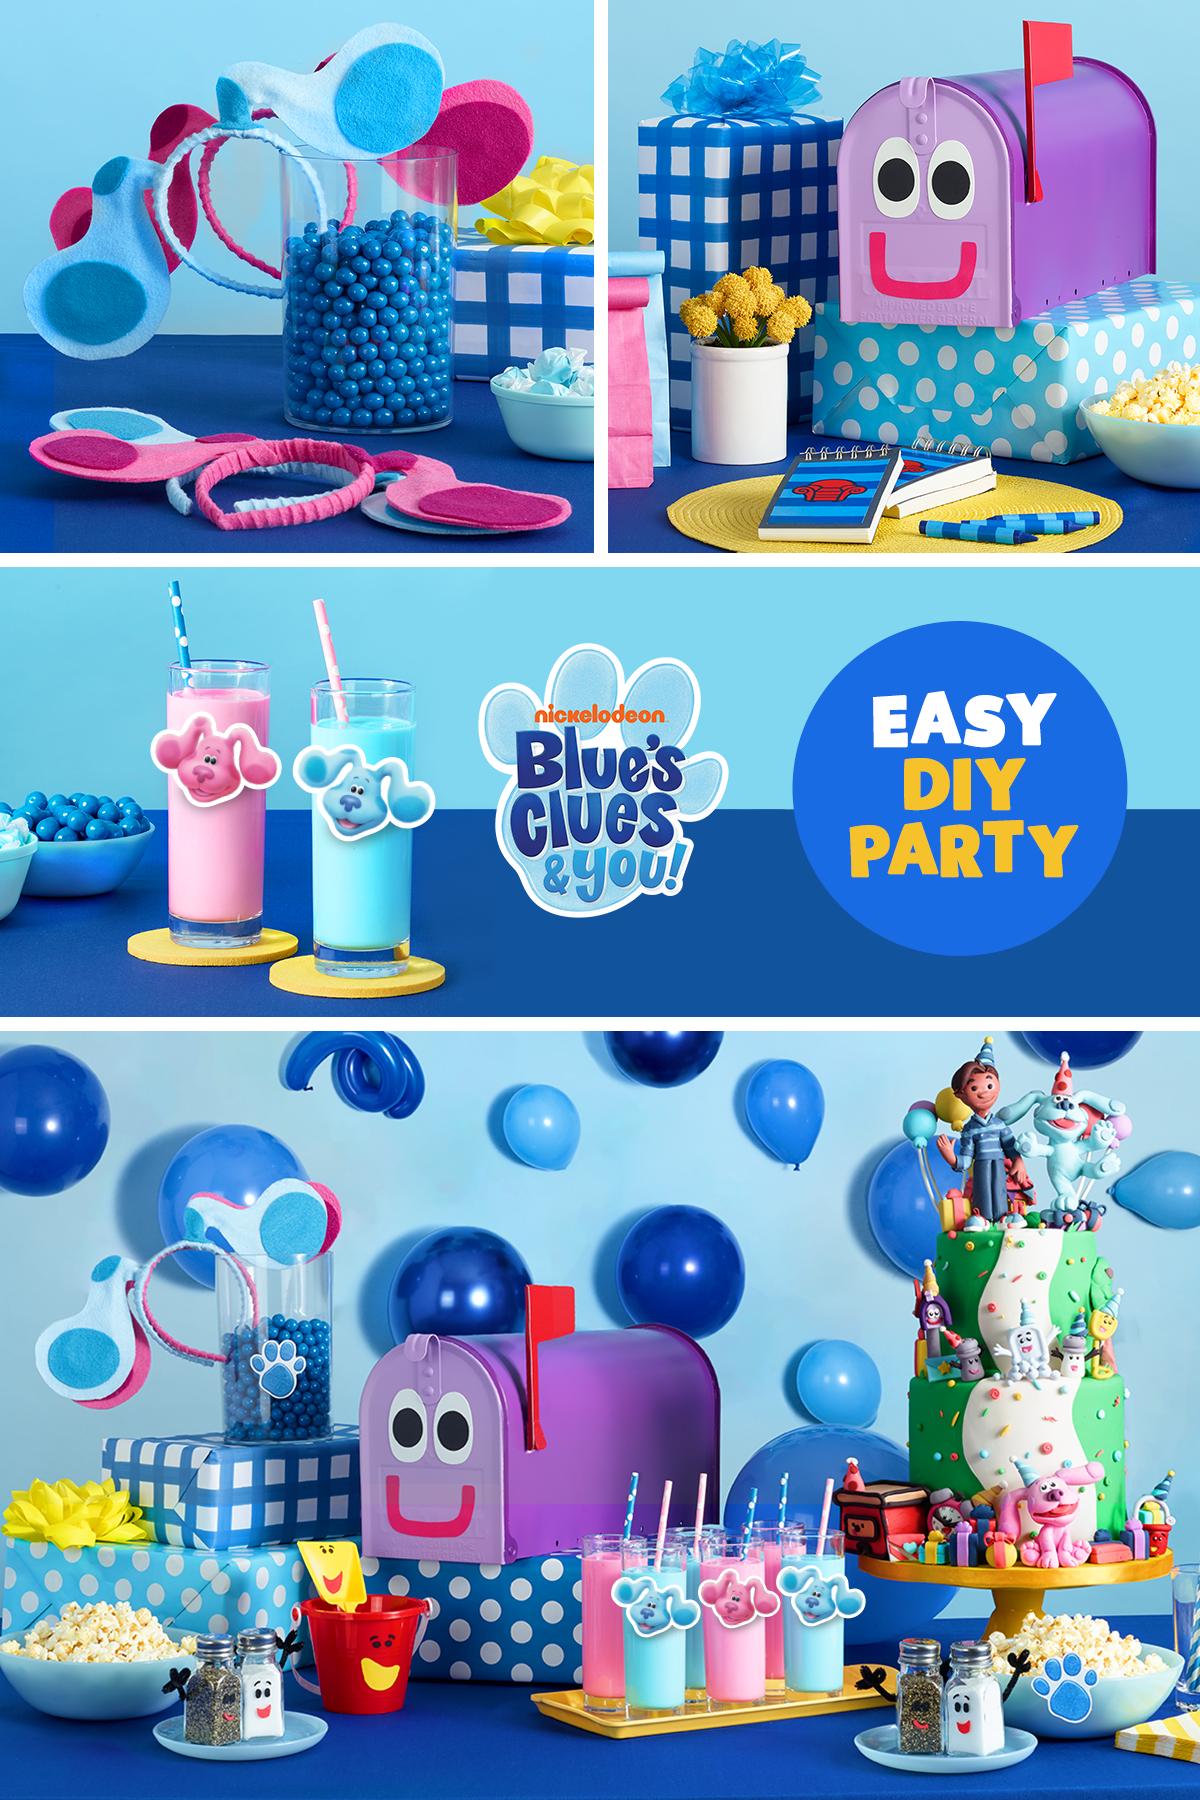 Blues clues birthday   Etsy